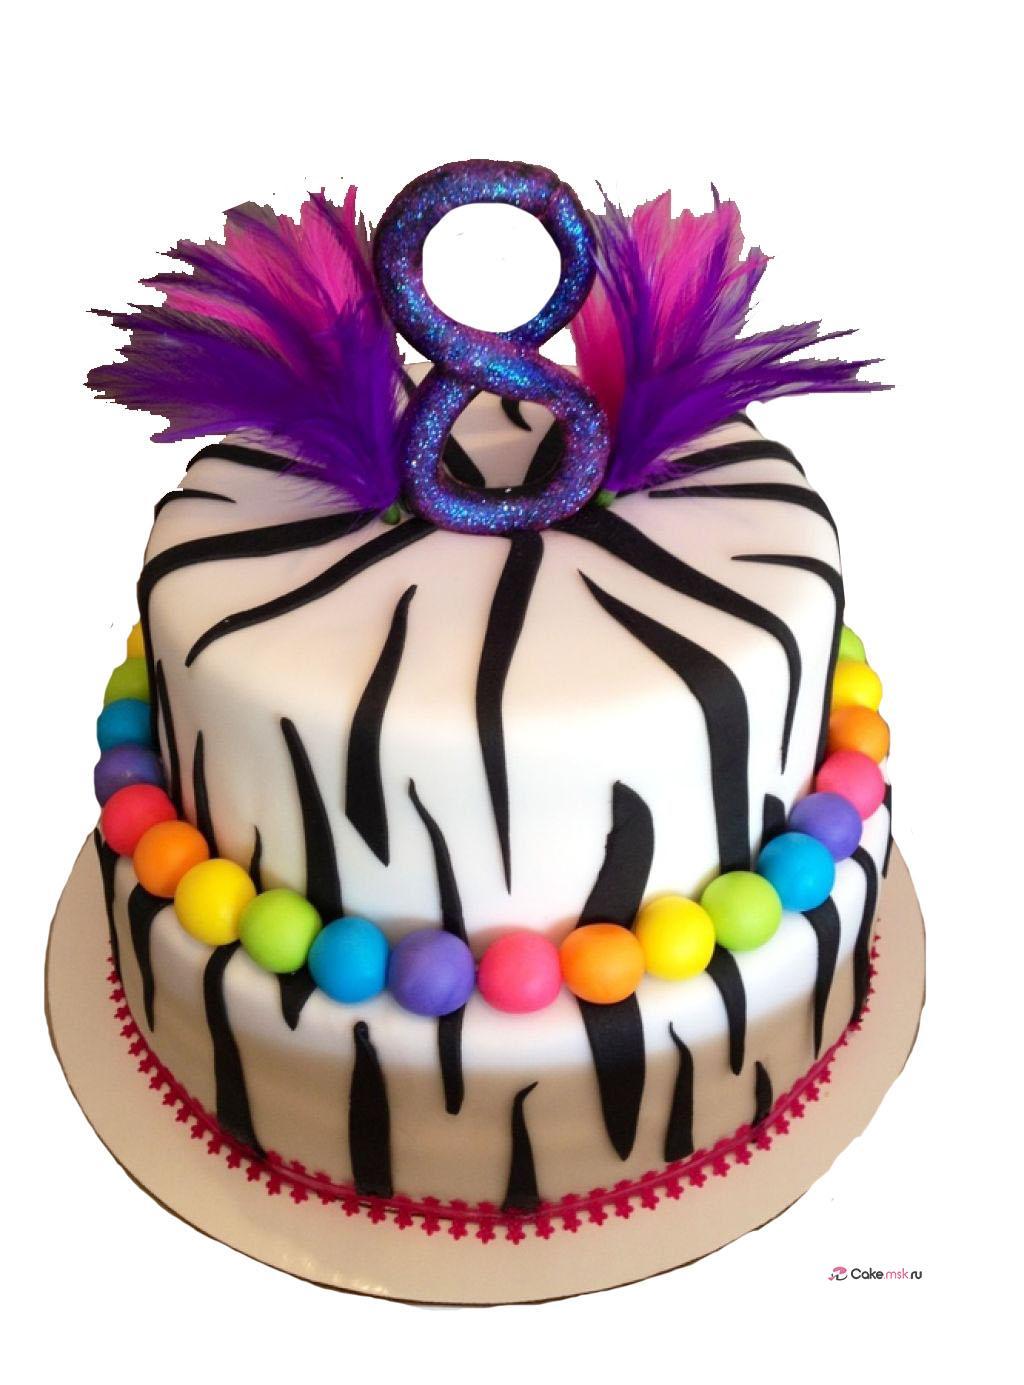 8-year-old-girl-birthday-cake-ideas-554843f4400d6